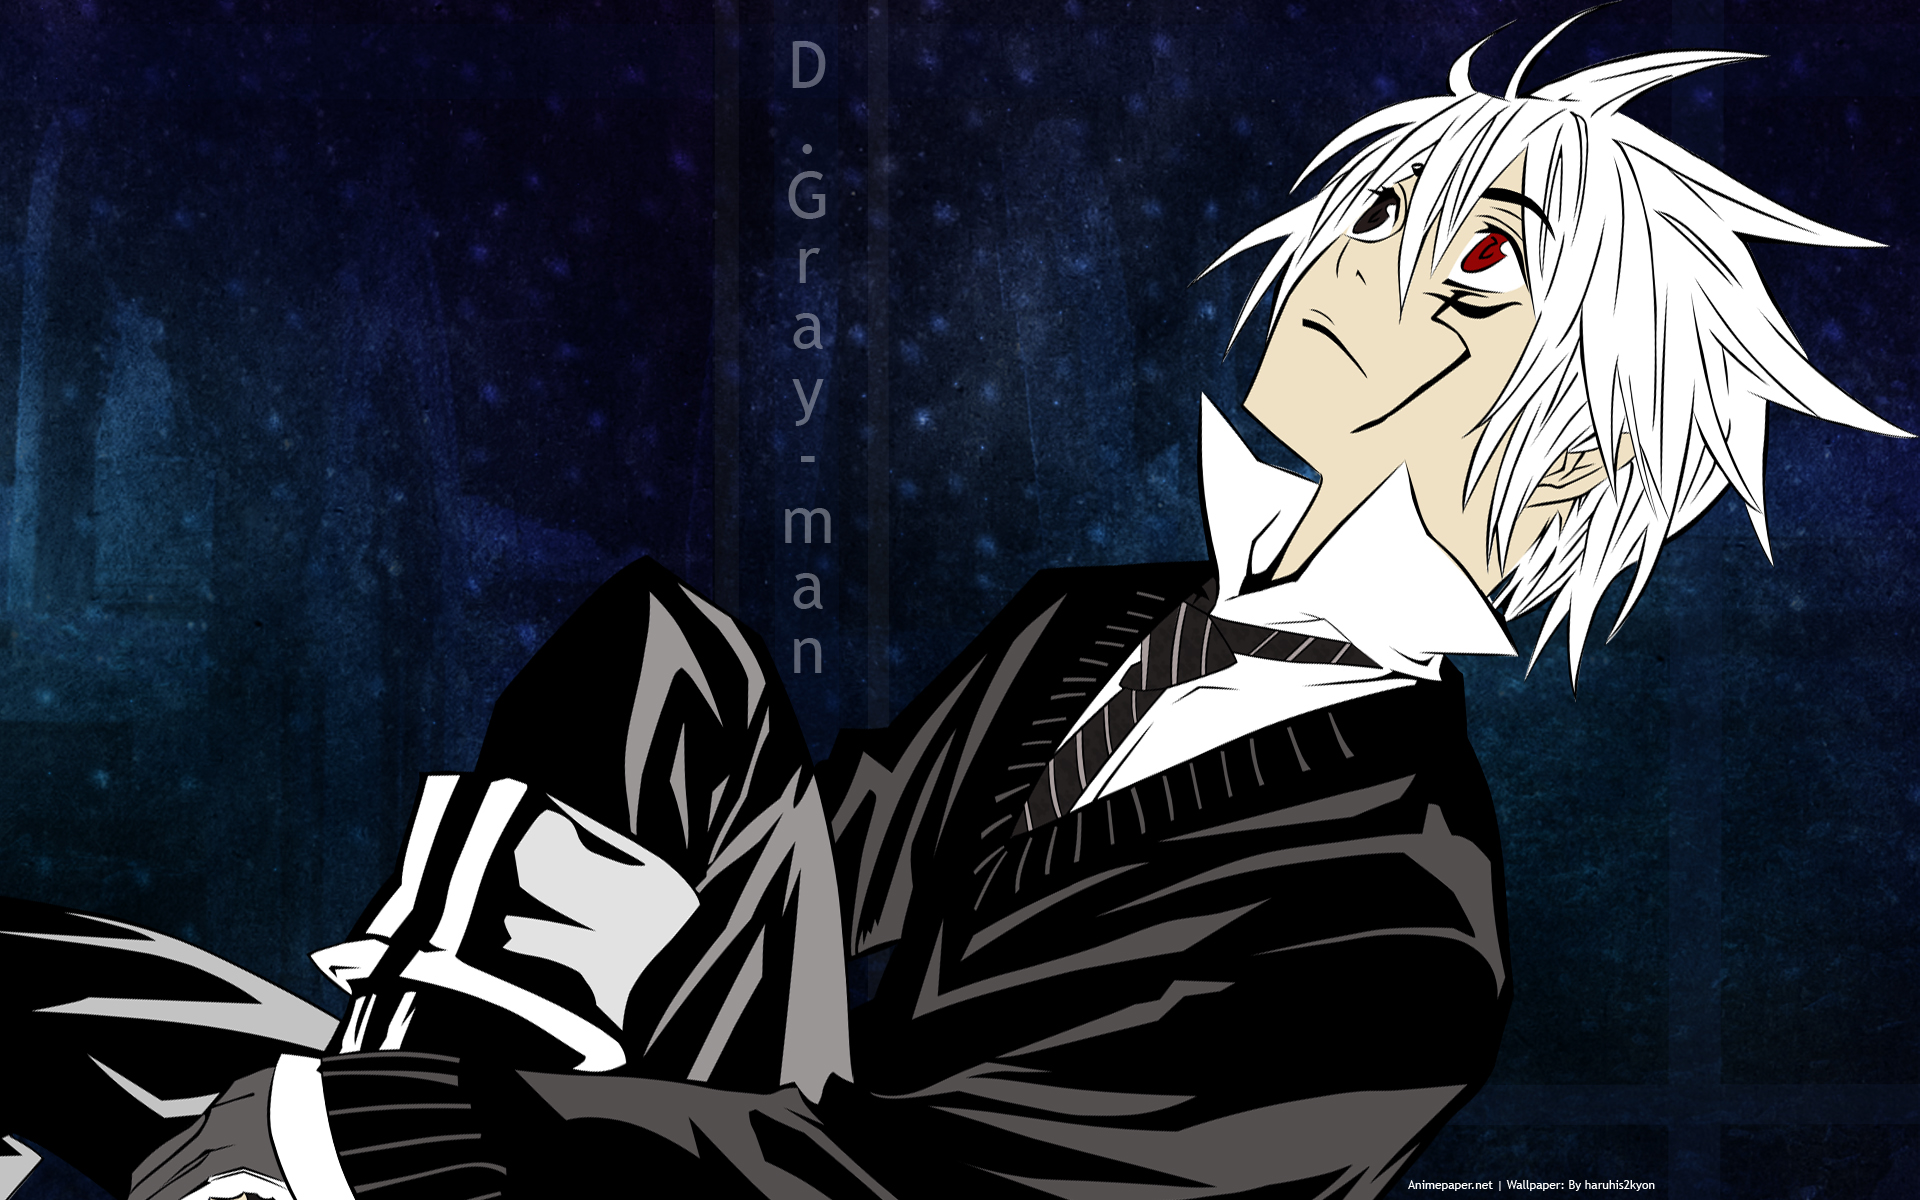 D Gray Man Wallpaper 25 Desktop Background - Animewp.com